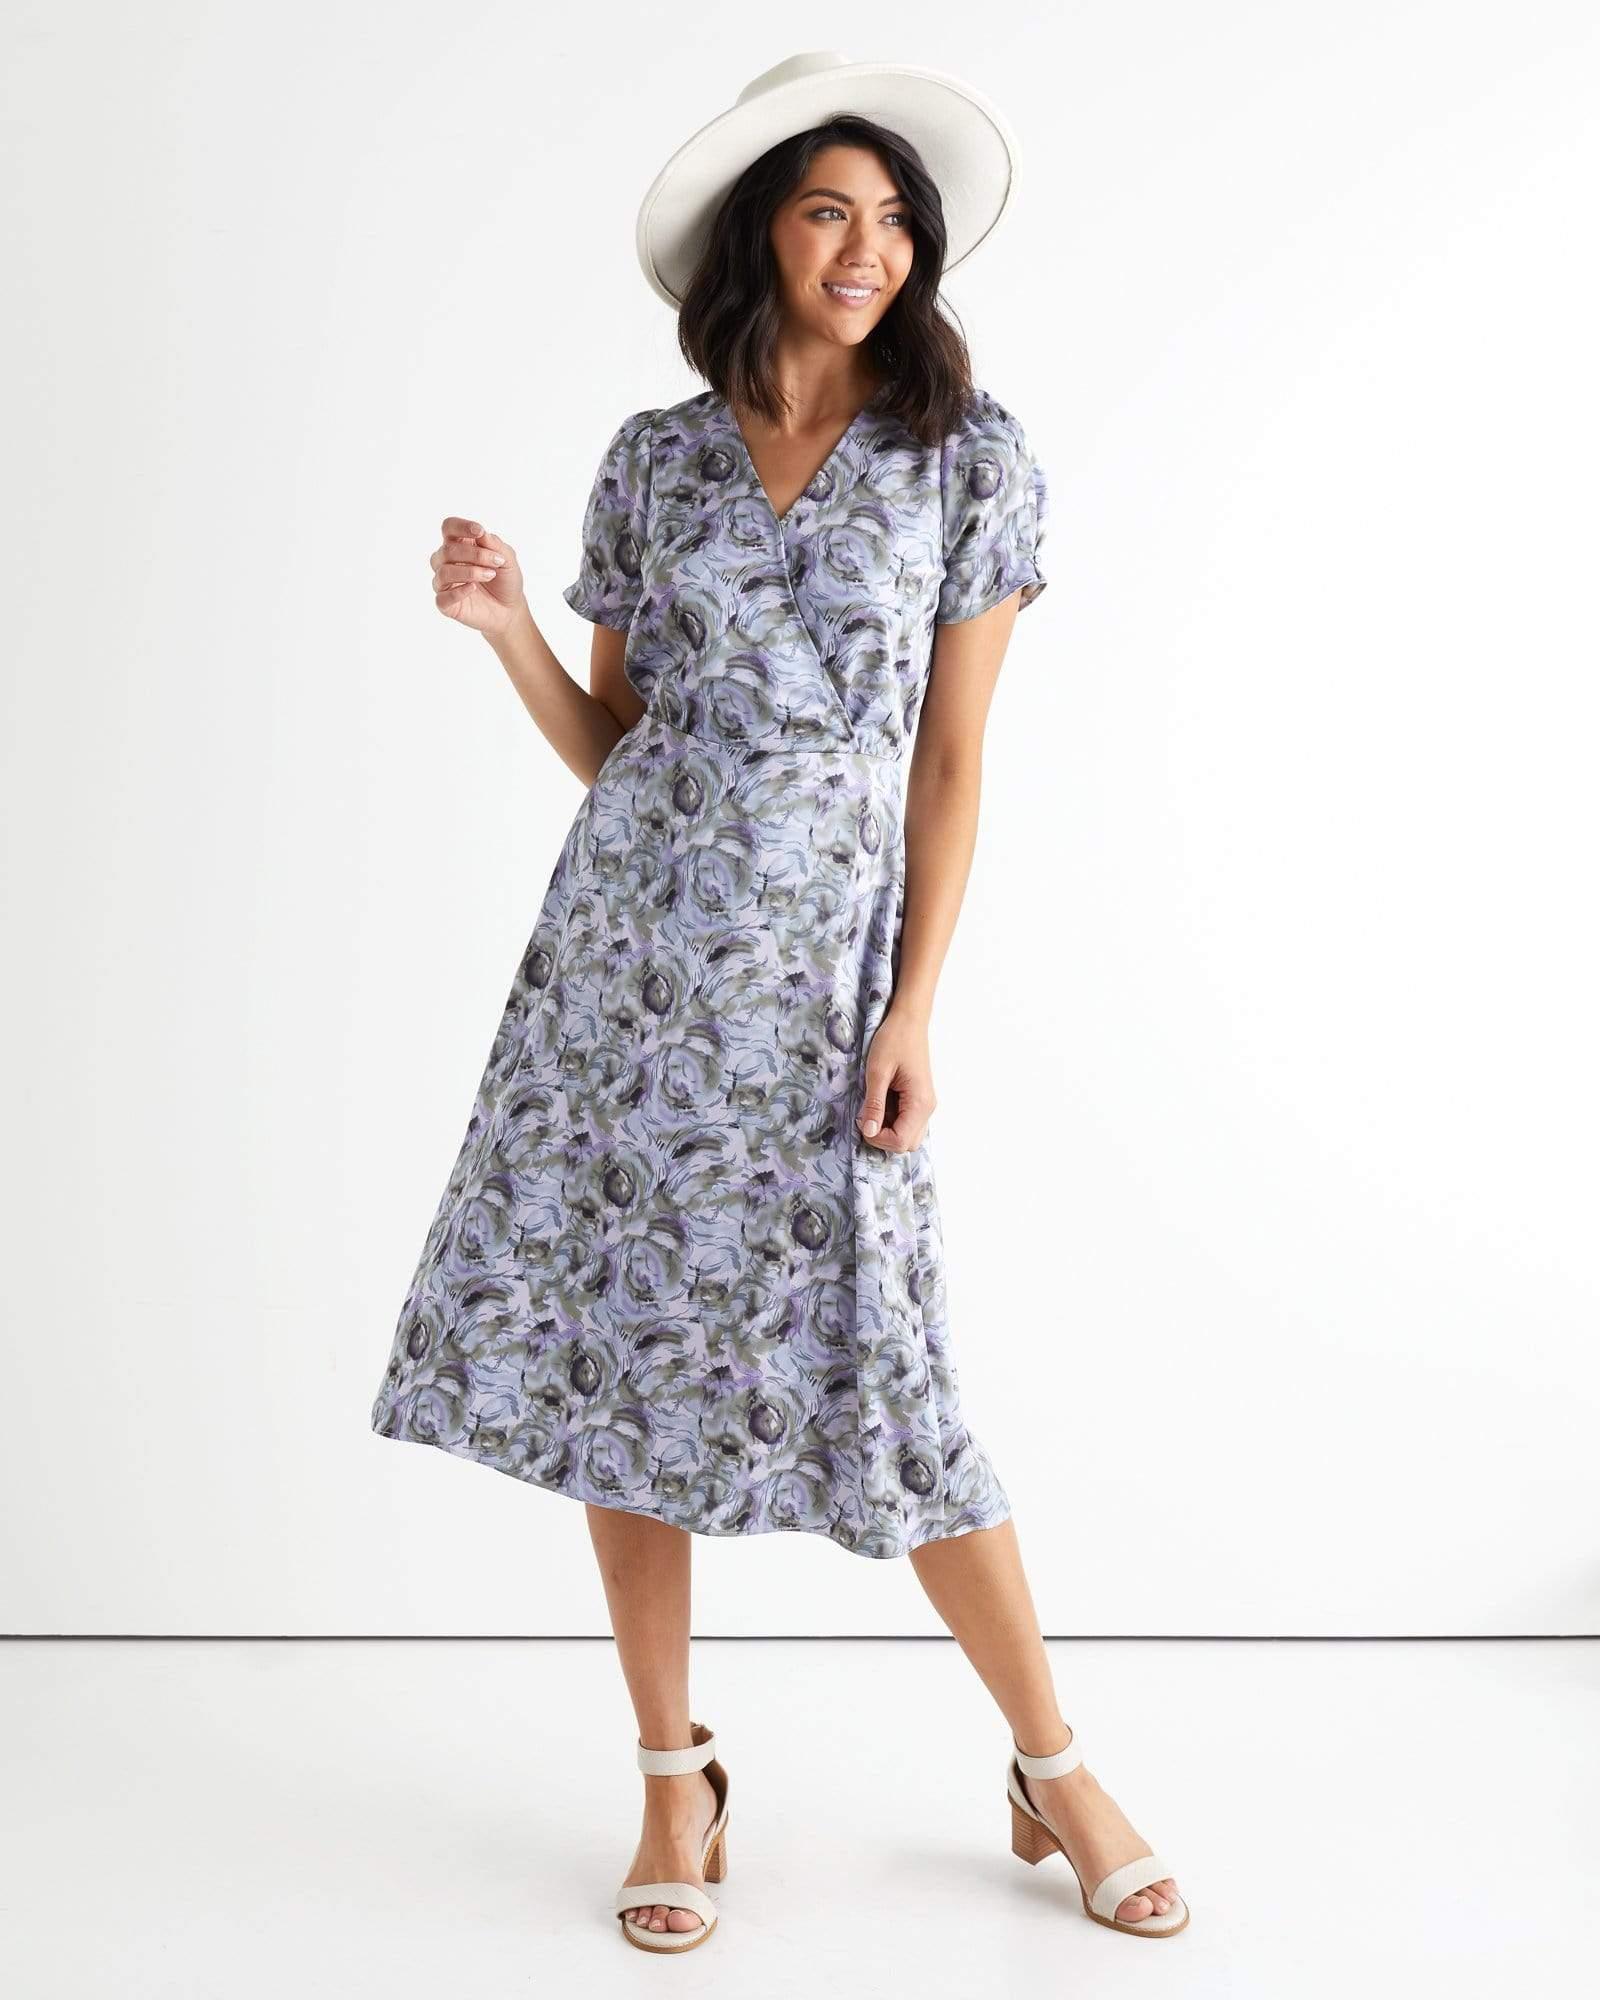 Downeast-Celia-Dress